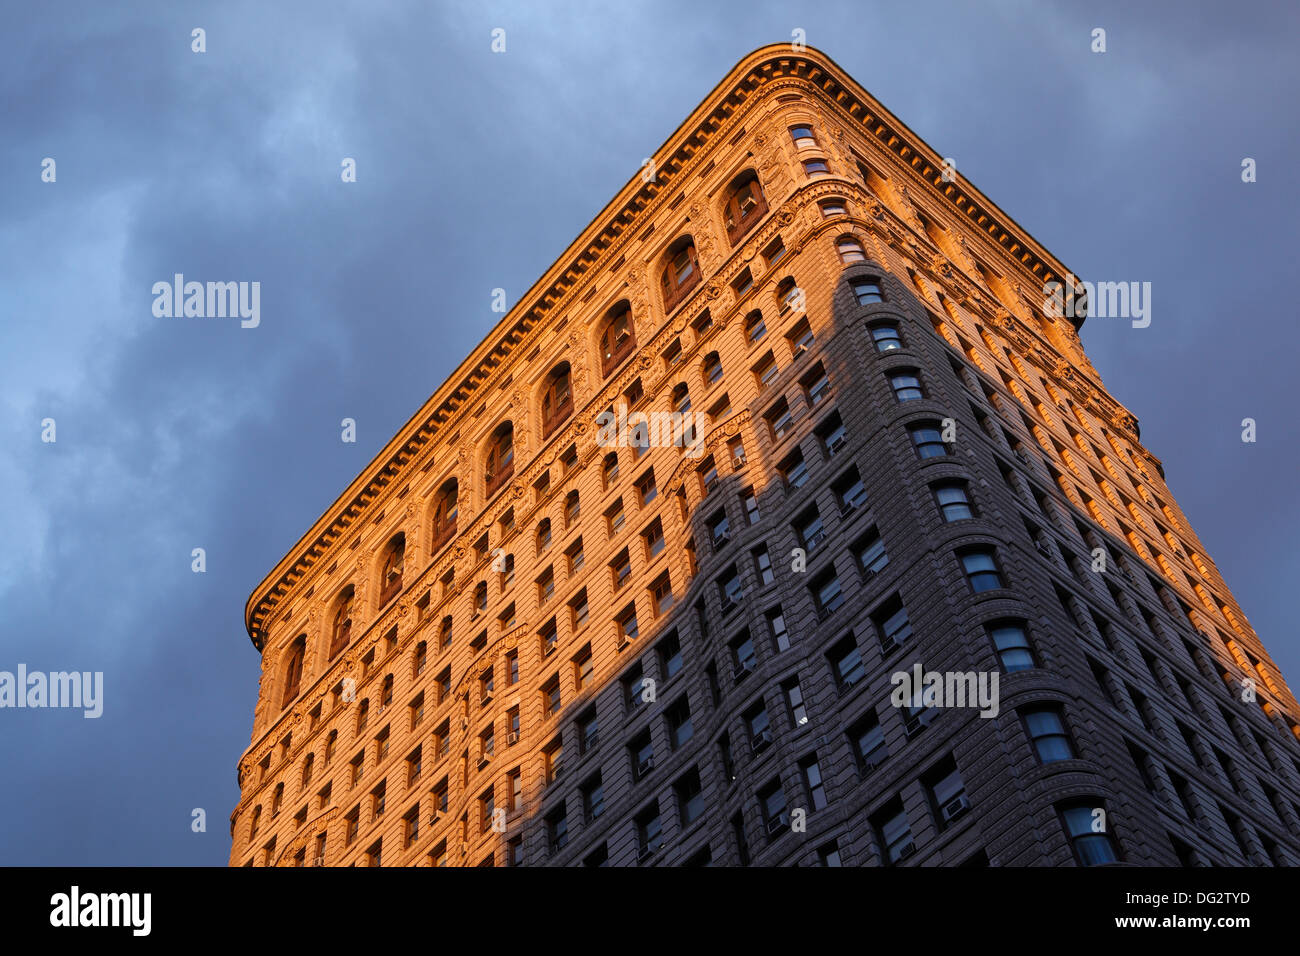 Flatiron building New York City - Stock Image